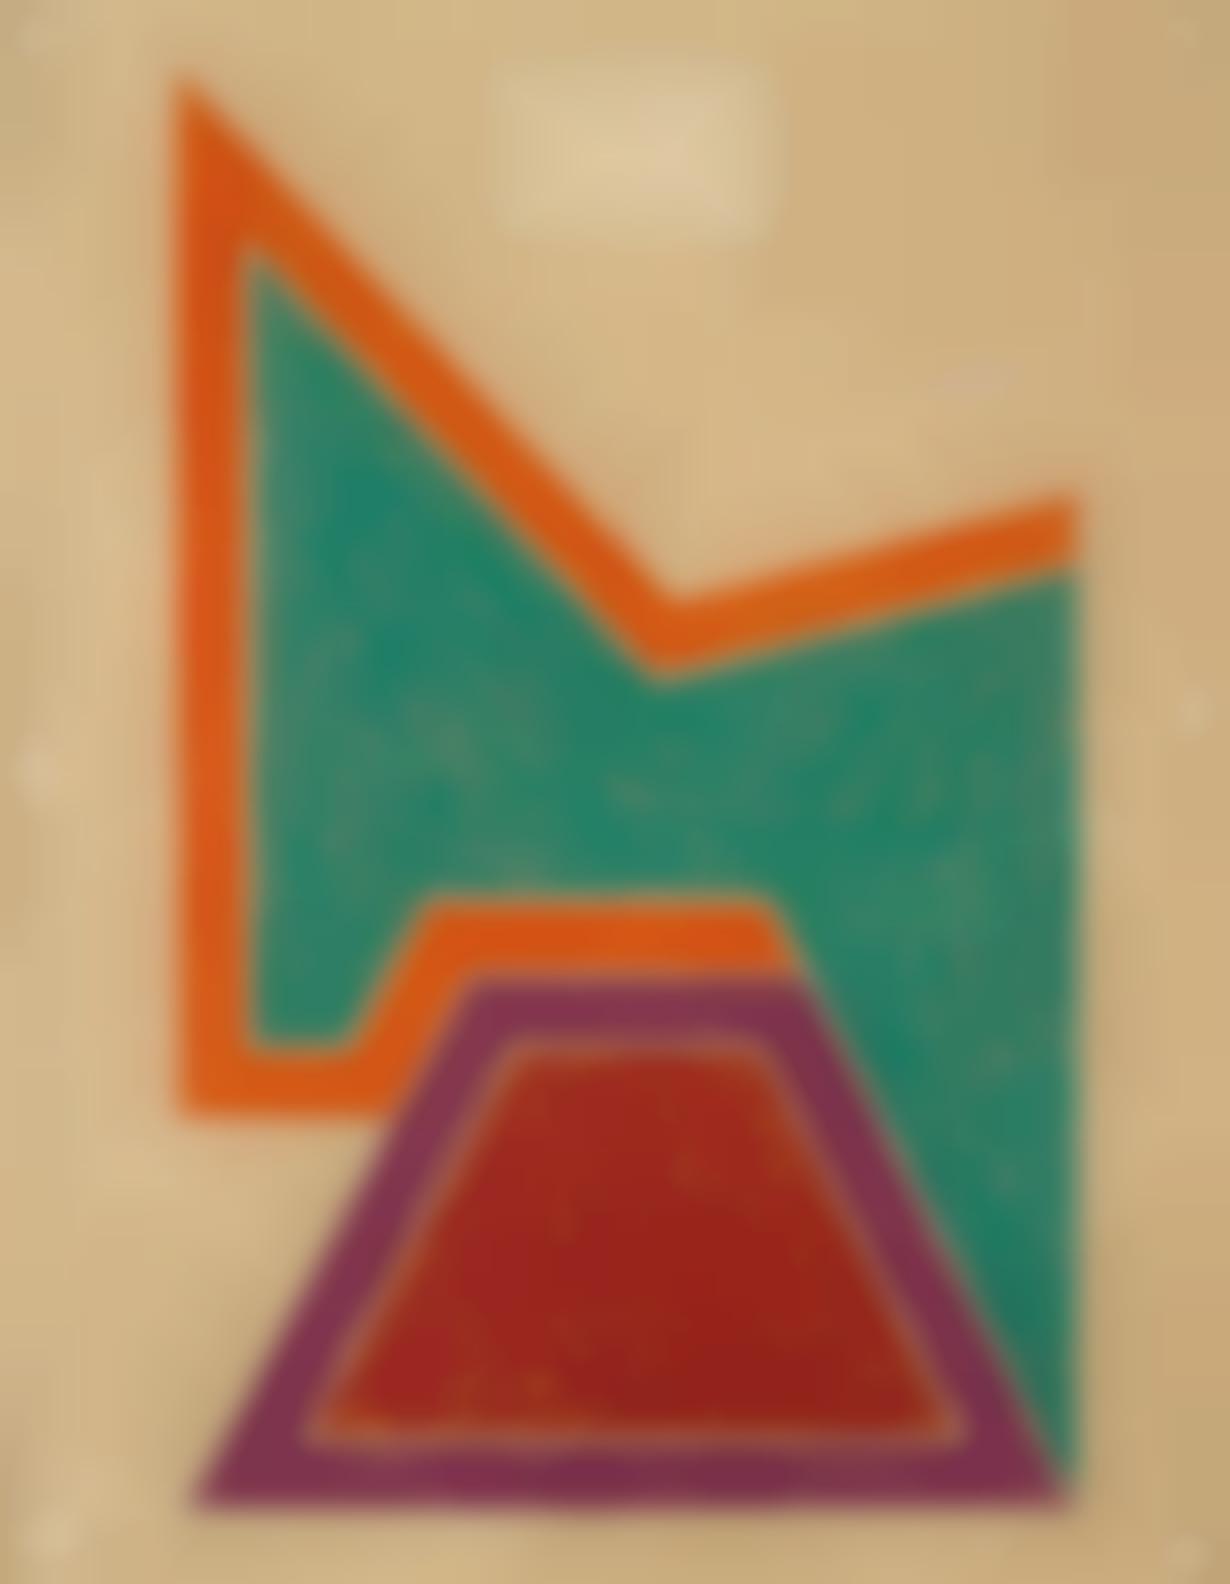 Frank Stella-Wolfeboro, From Eccentric Polygons-1974